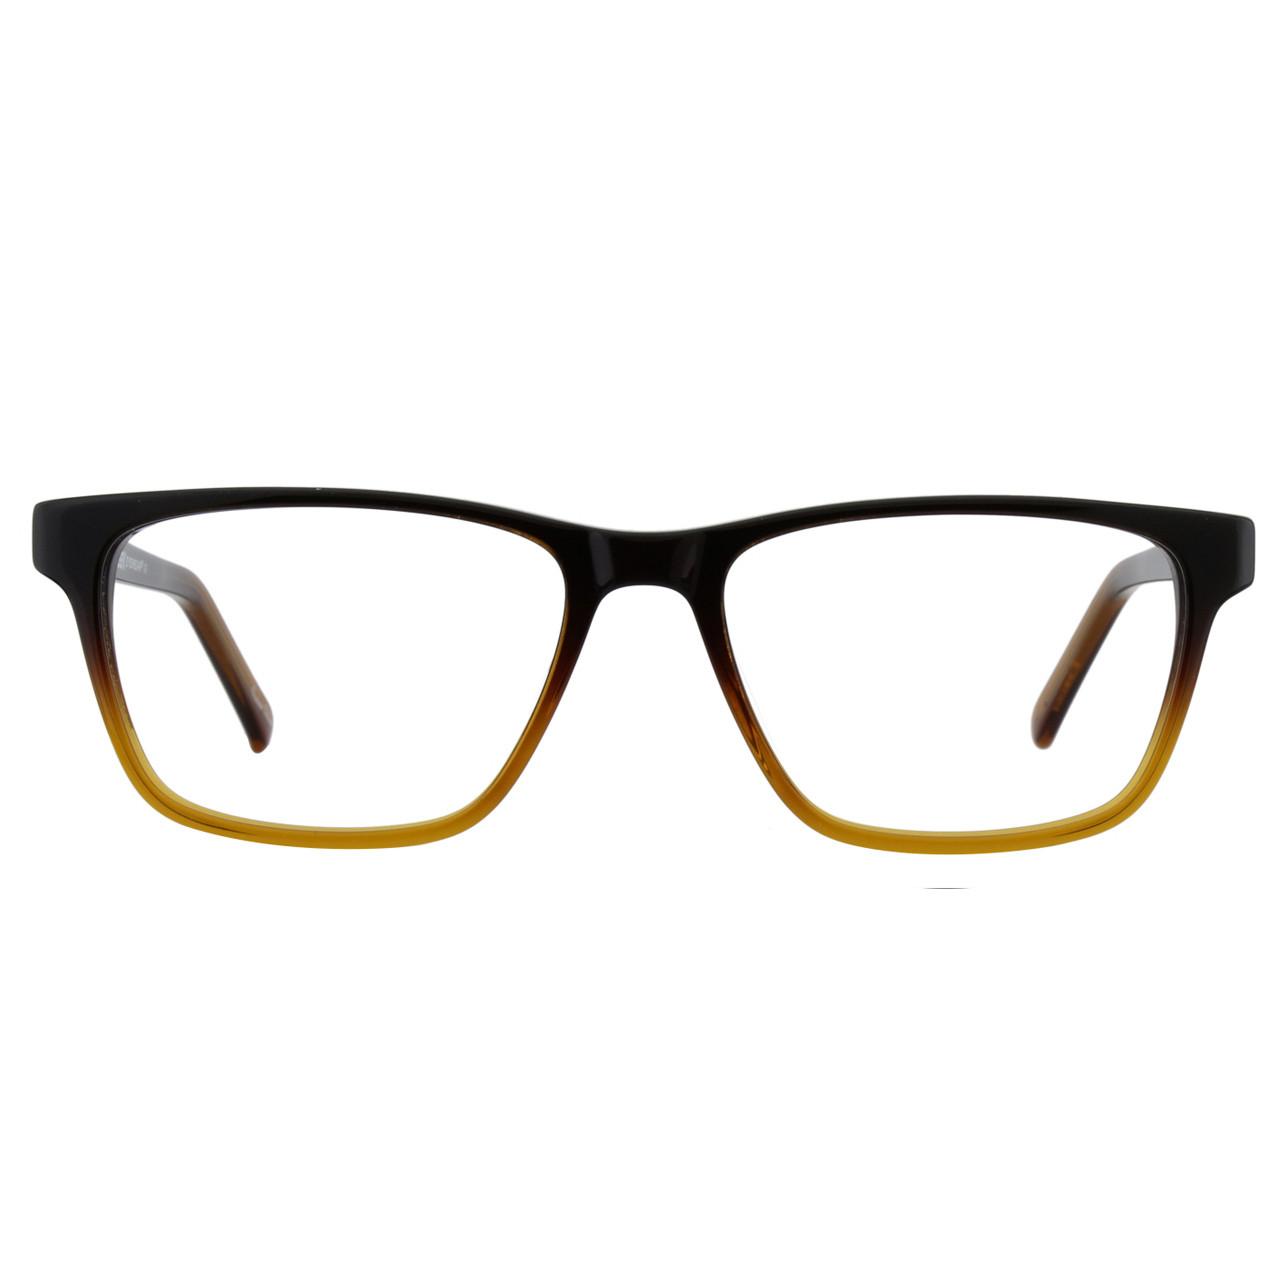 GEEK Eyewear GEEK FRIDAY